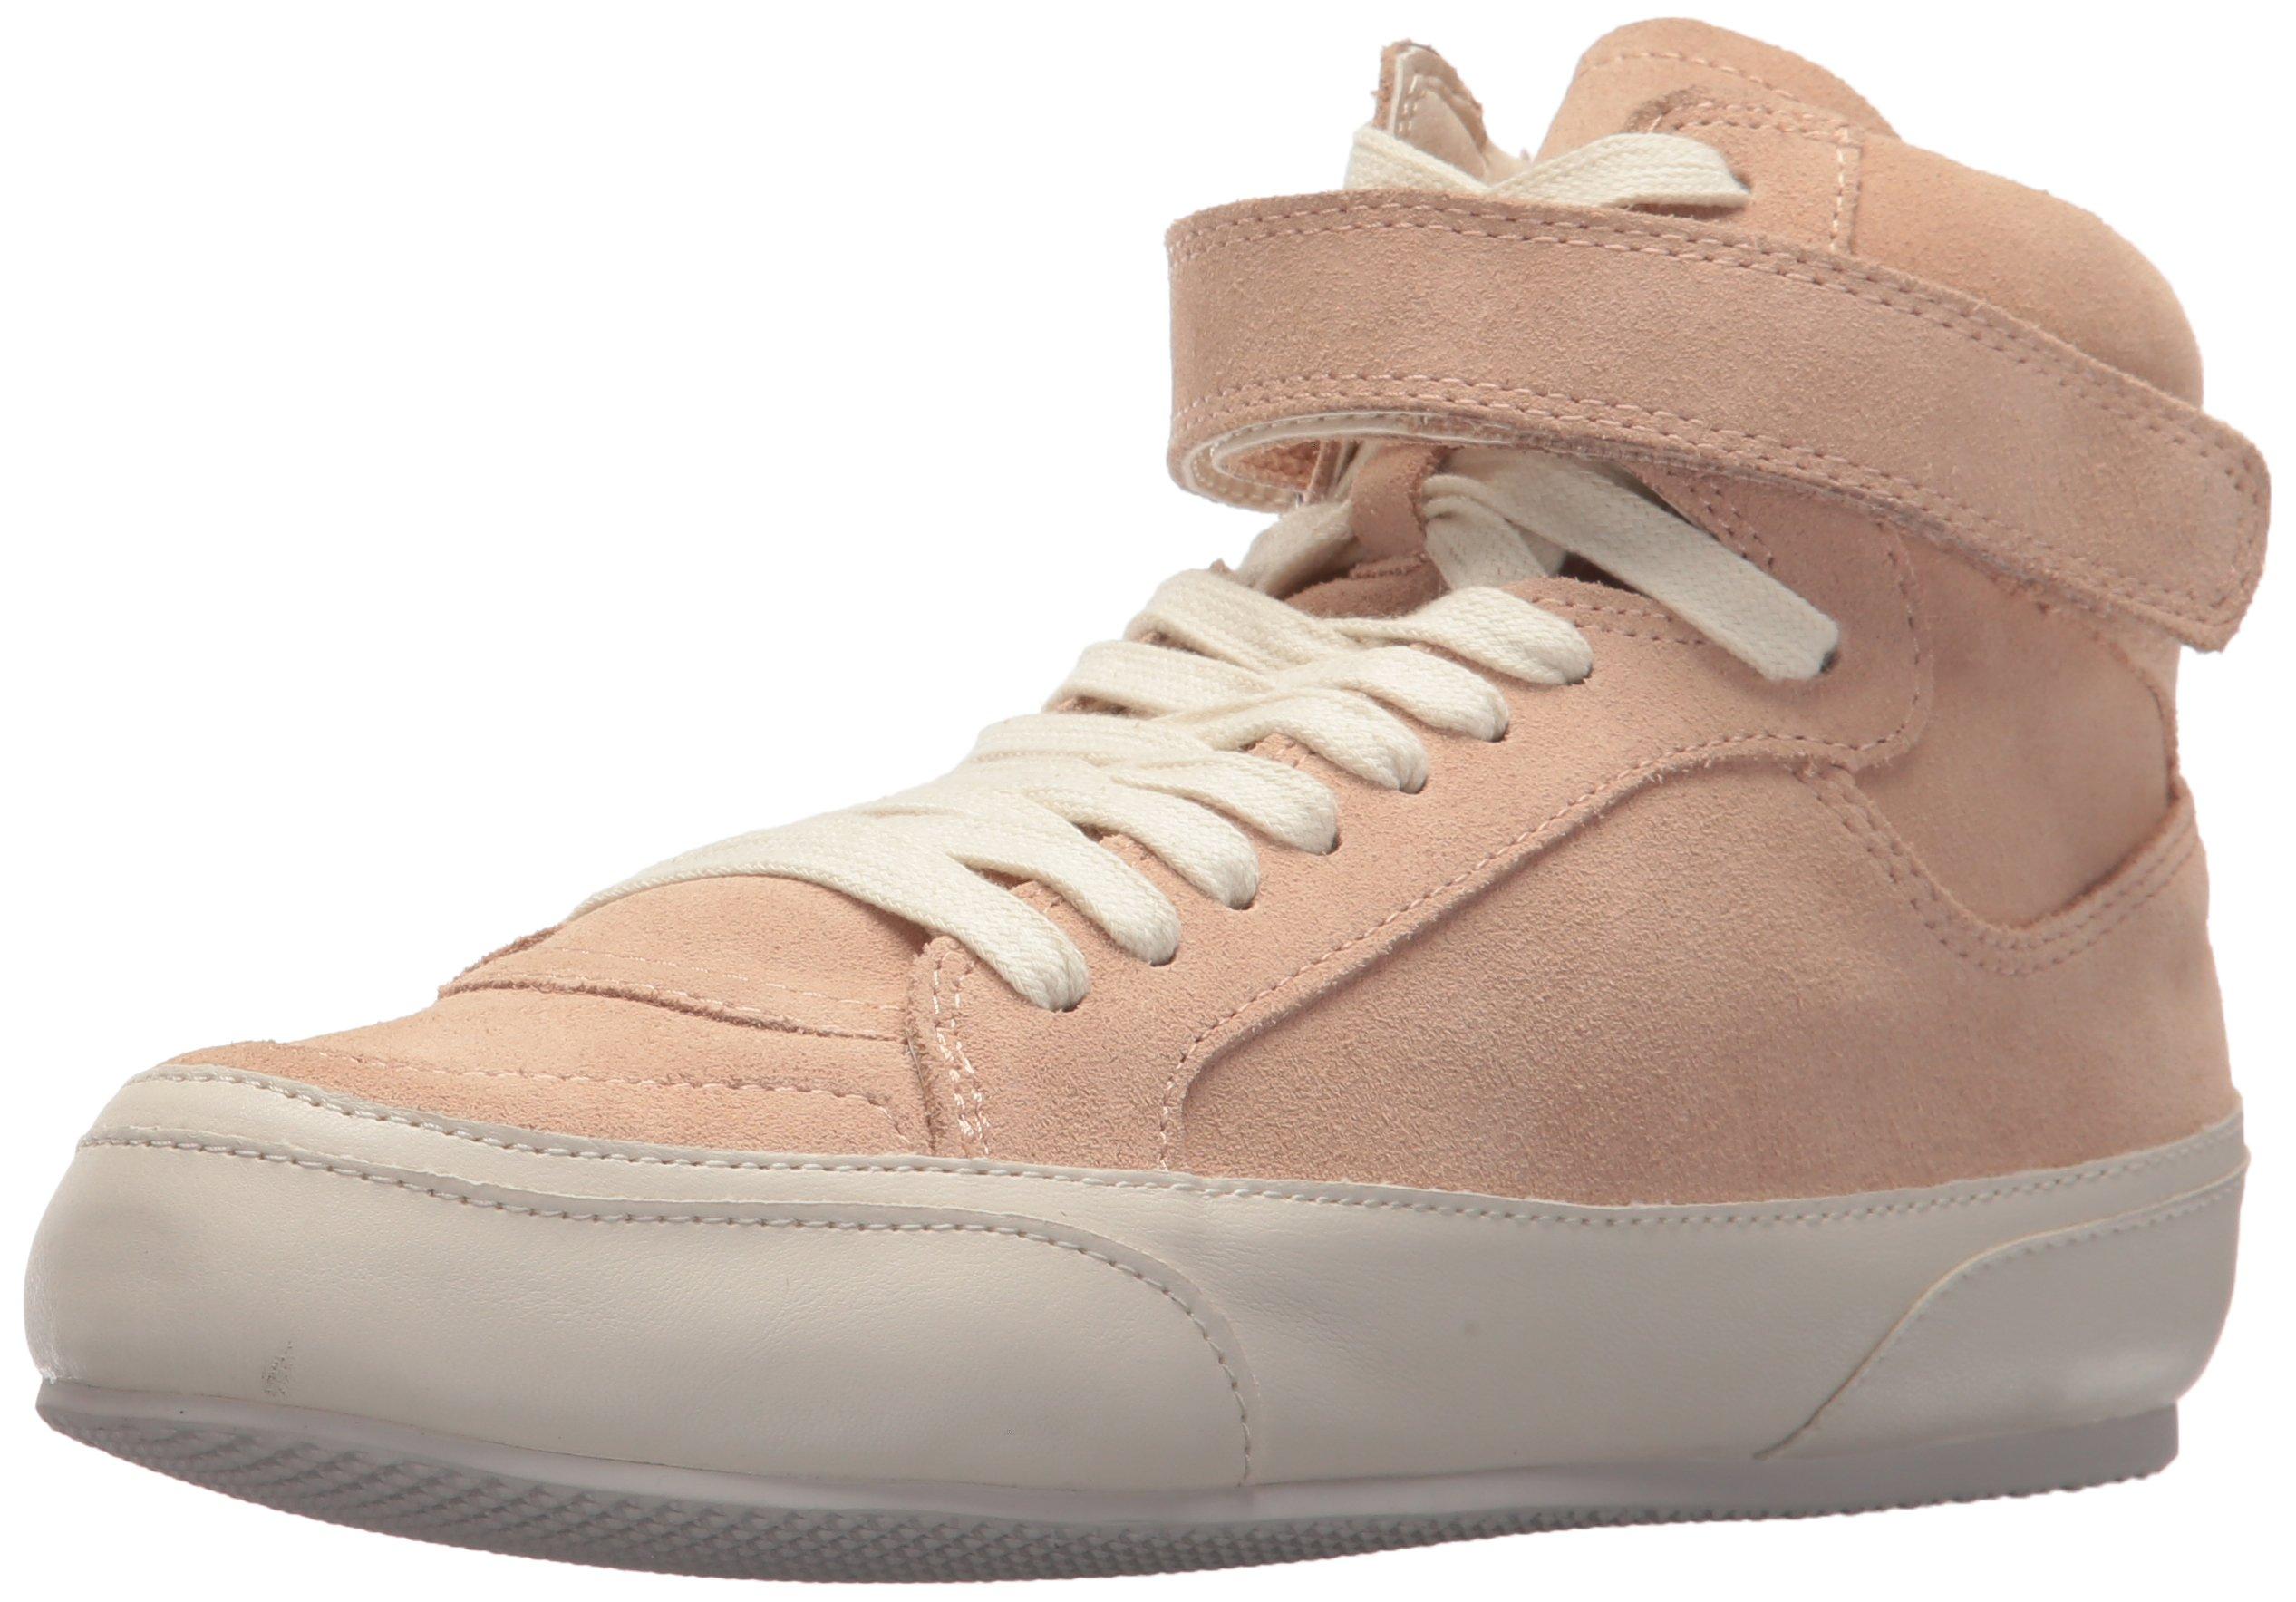 Dolce Vita Women's Westly Sneaker, Blush Suede, 9 Medium US